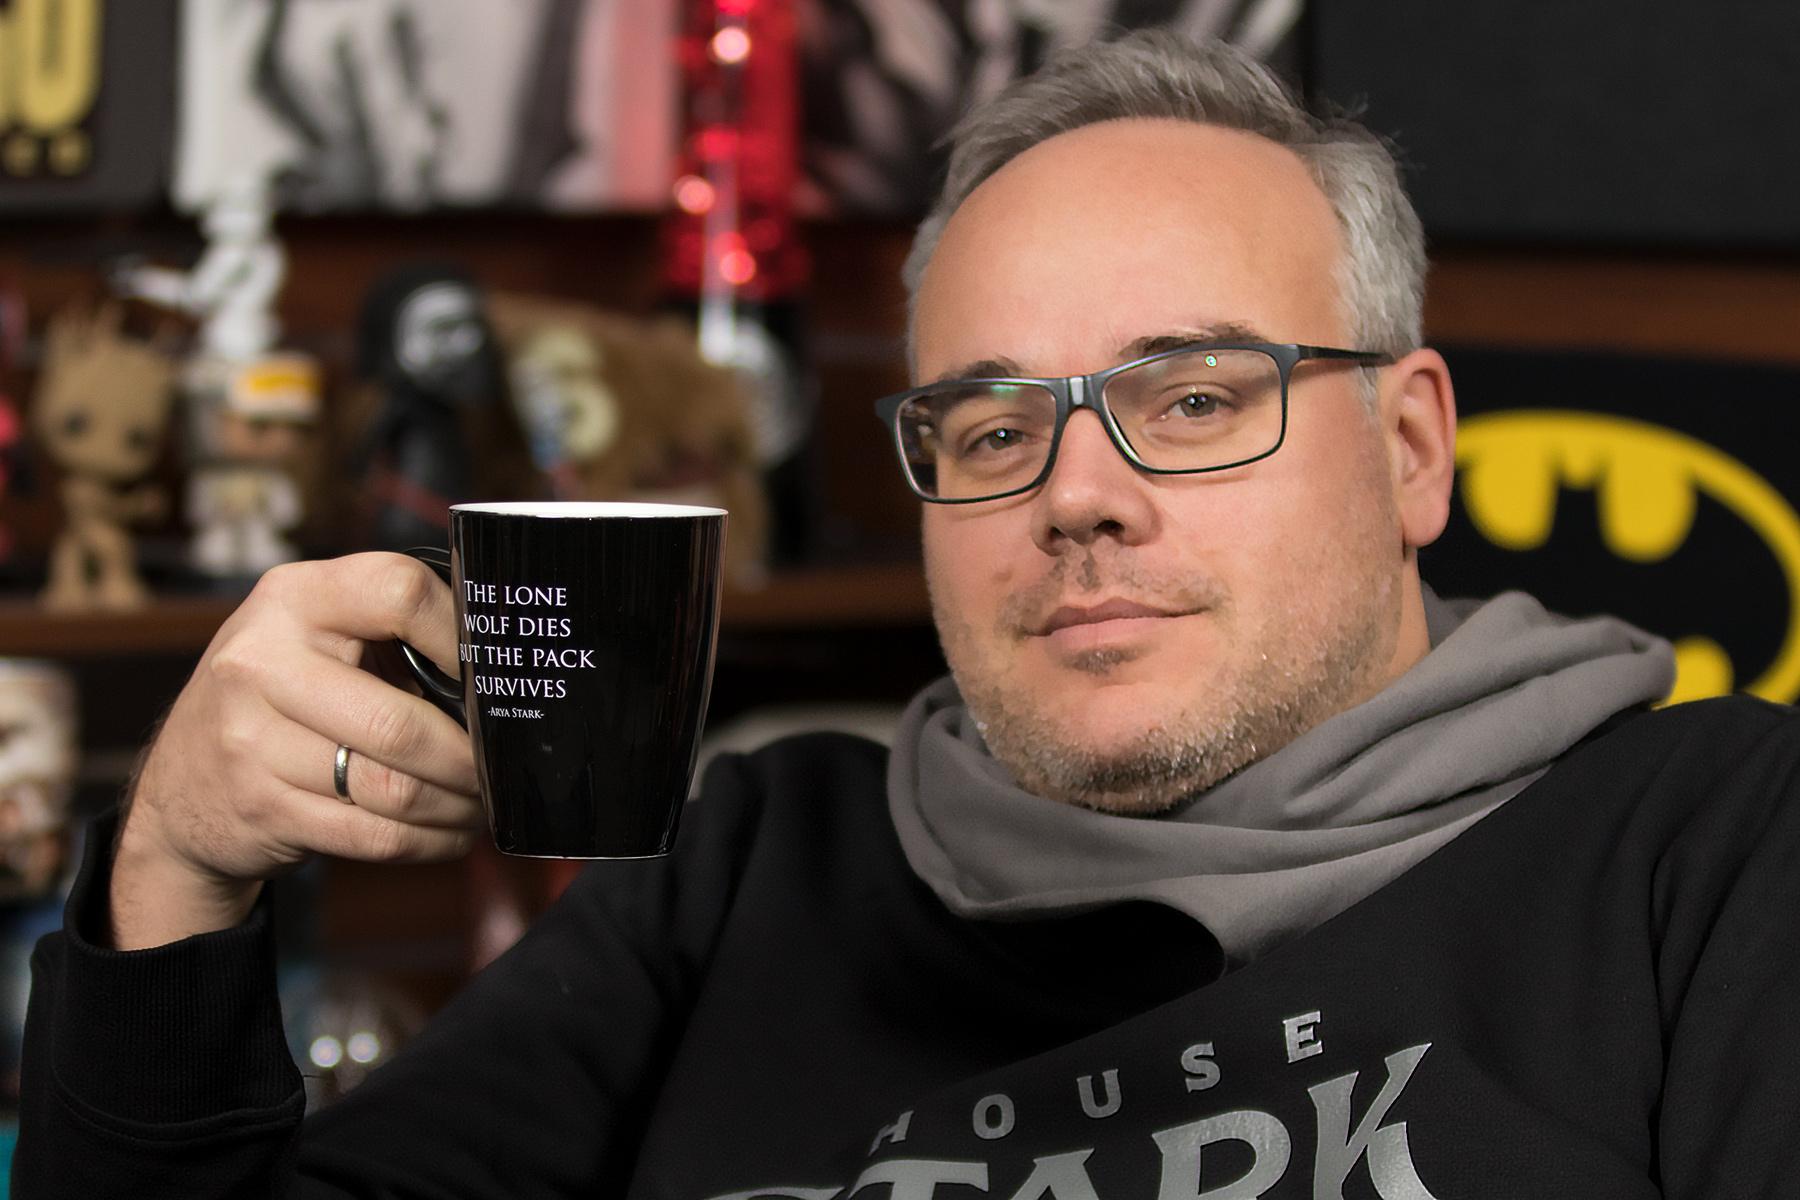 Jens Geschenketipp: Game of Thrones - The Pack Survives Noble Words Tasse